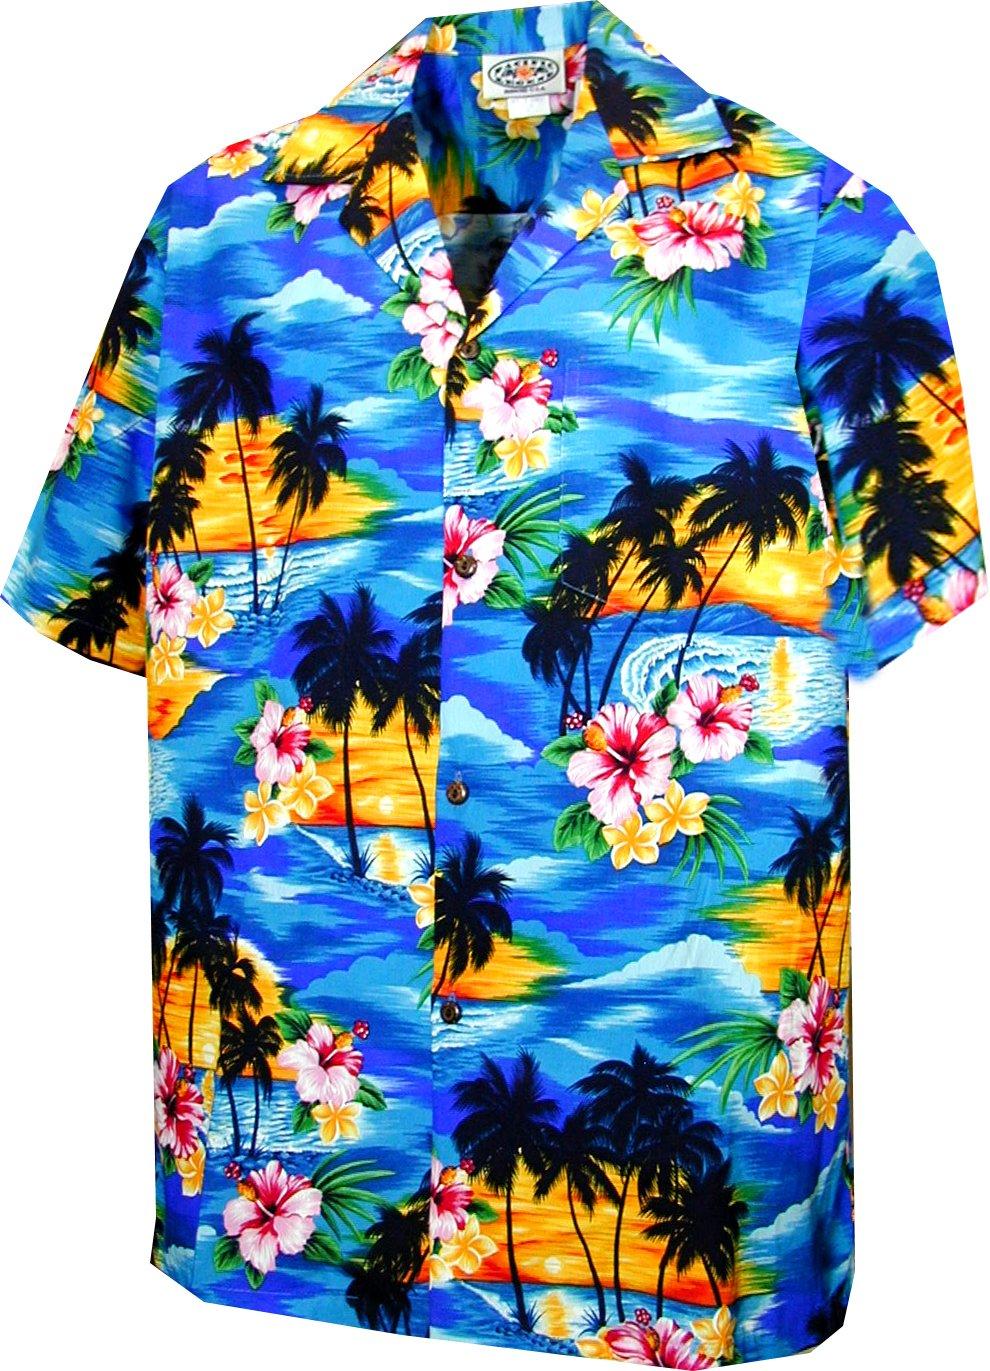 Pacific Legend Boys Brilliant Hawaiian Island Sunset Shirt BLUE M